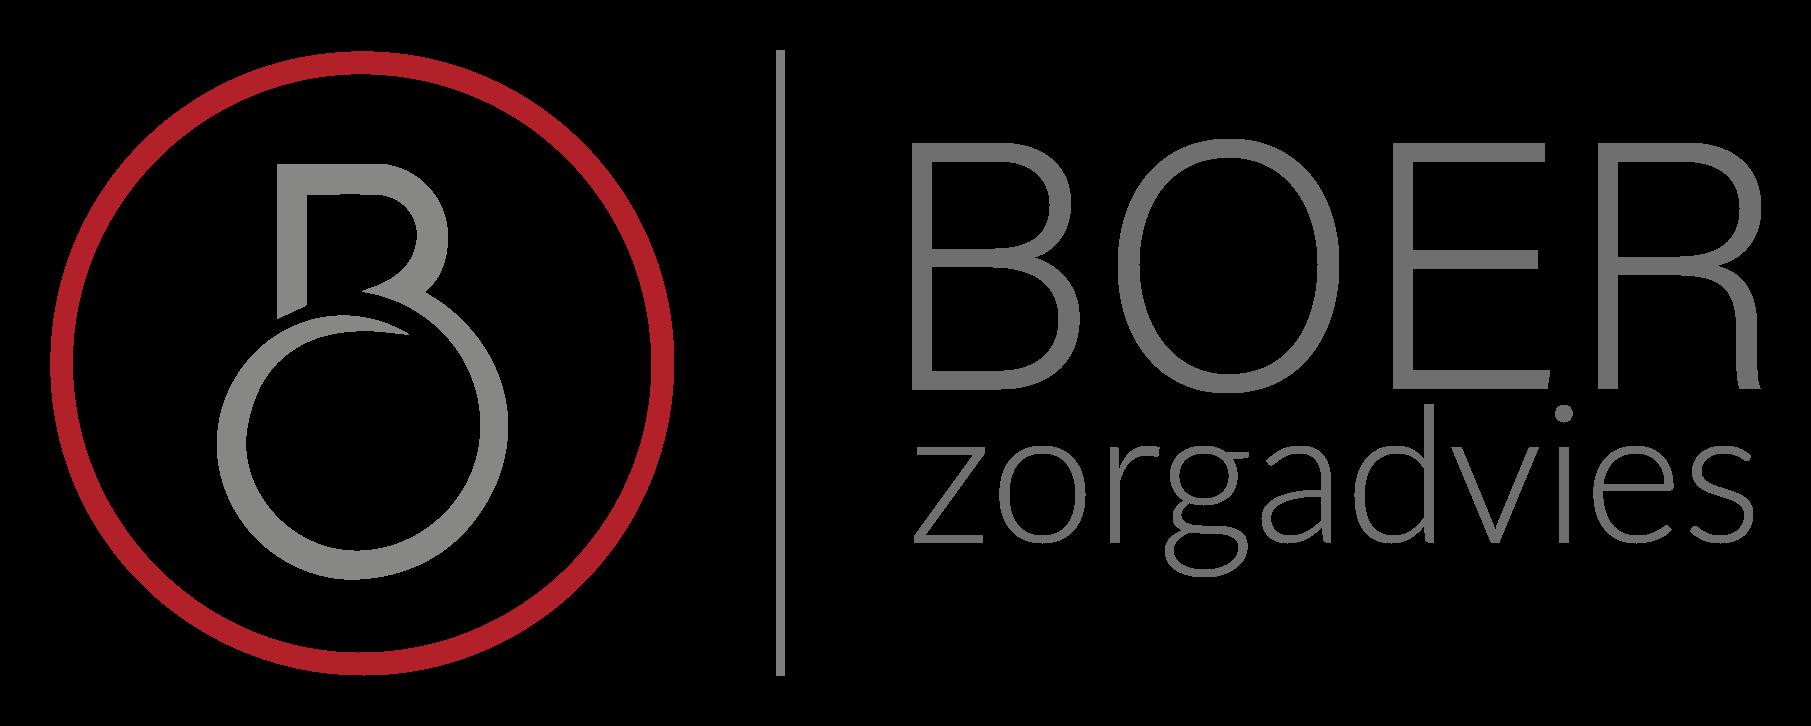 Boer Zorgadvies